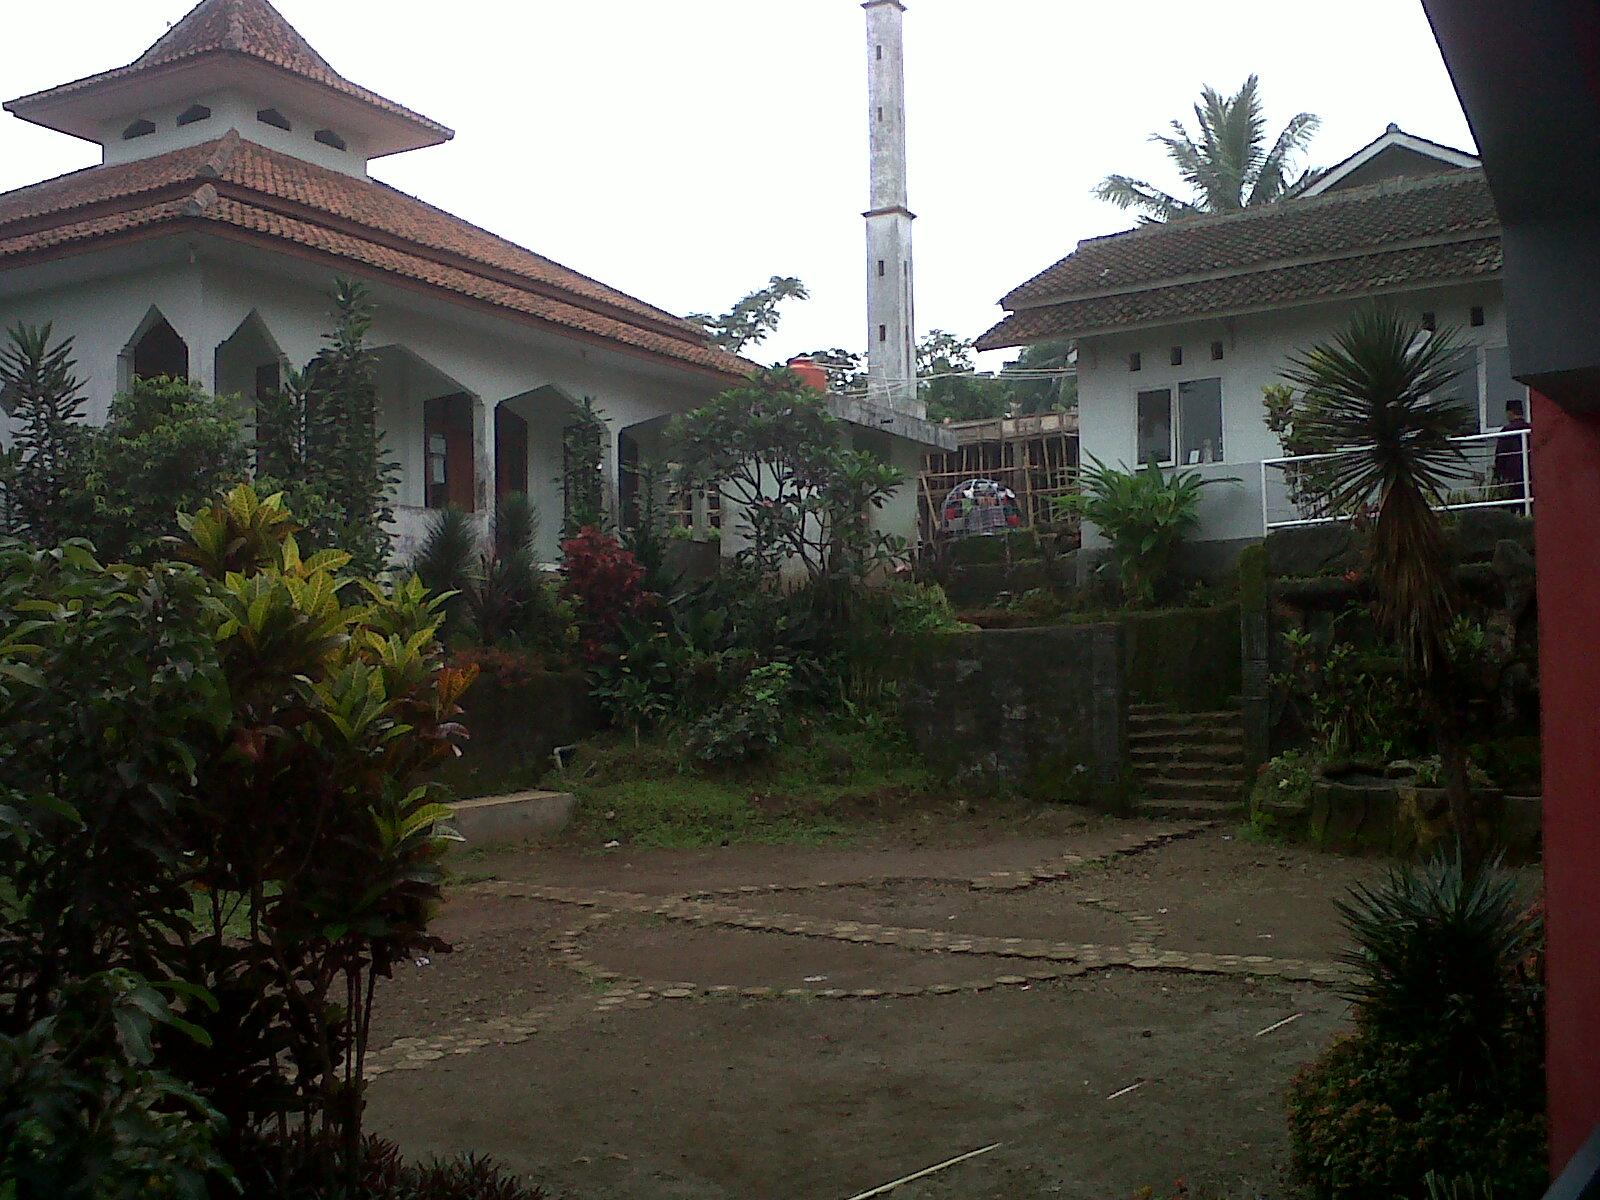 Img01416-20121214-0928